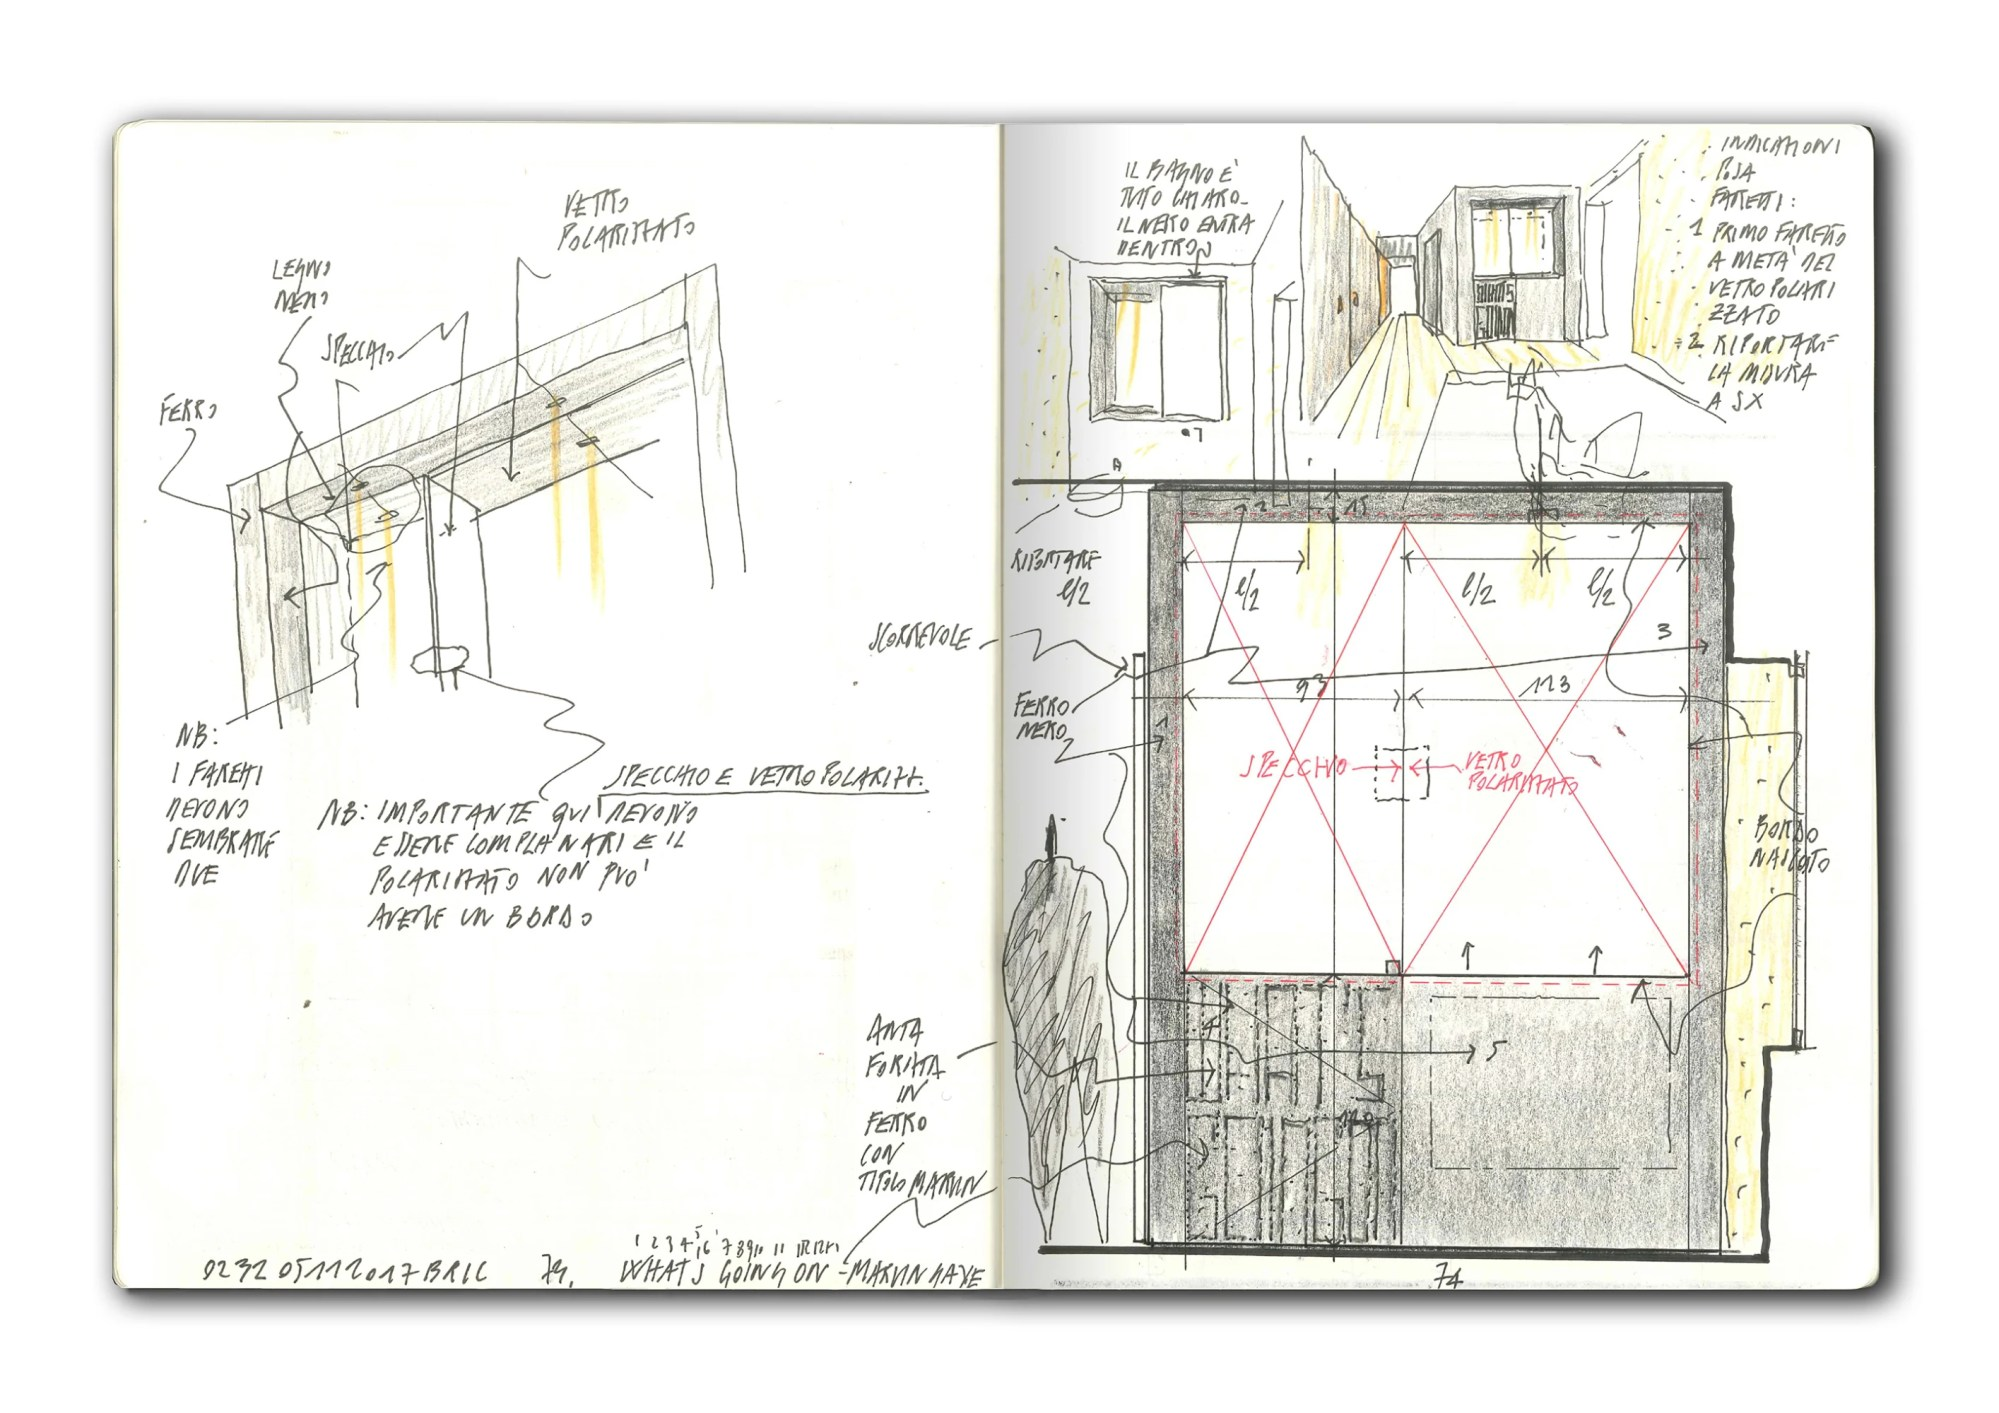 hight resolution of bricolo falsarella atelier xyz verona penthouse